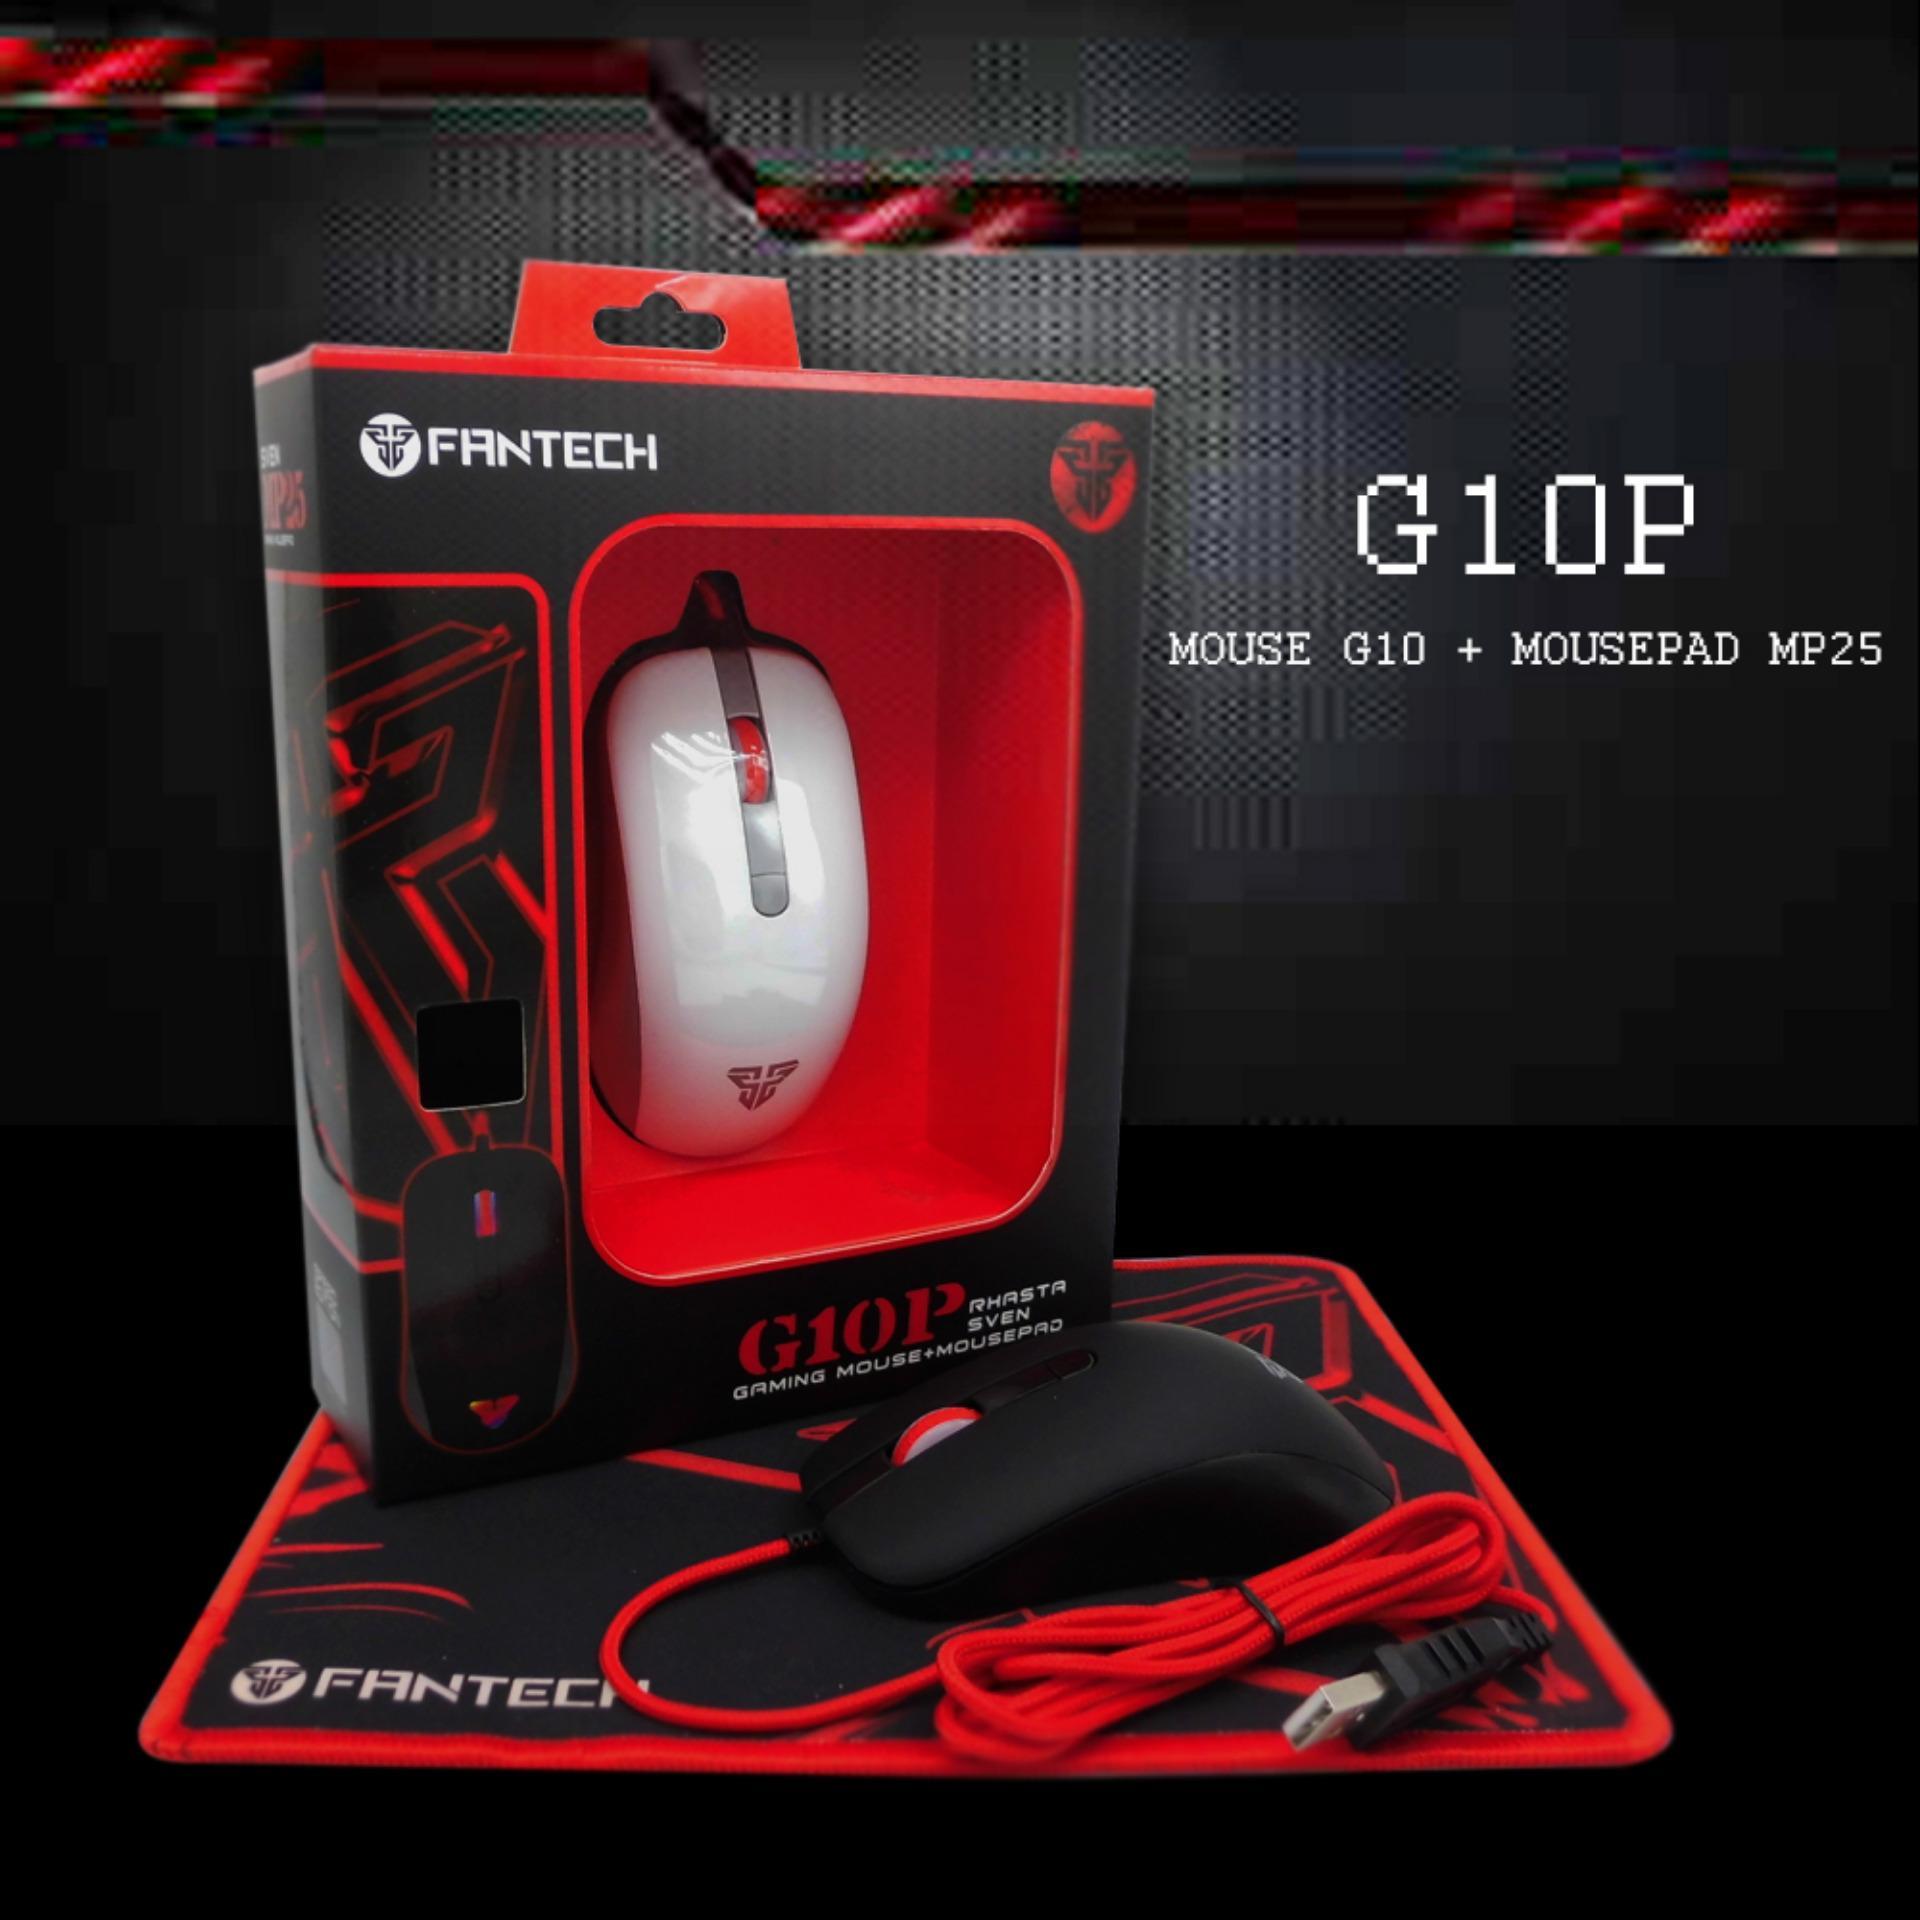 Beli Fantech G10P Rhasta Sven Mouse Gaming Mousepad Hitam Di North Sumatra